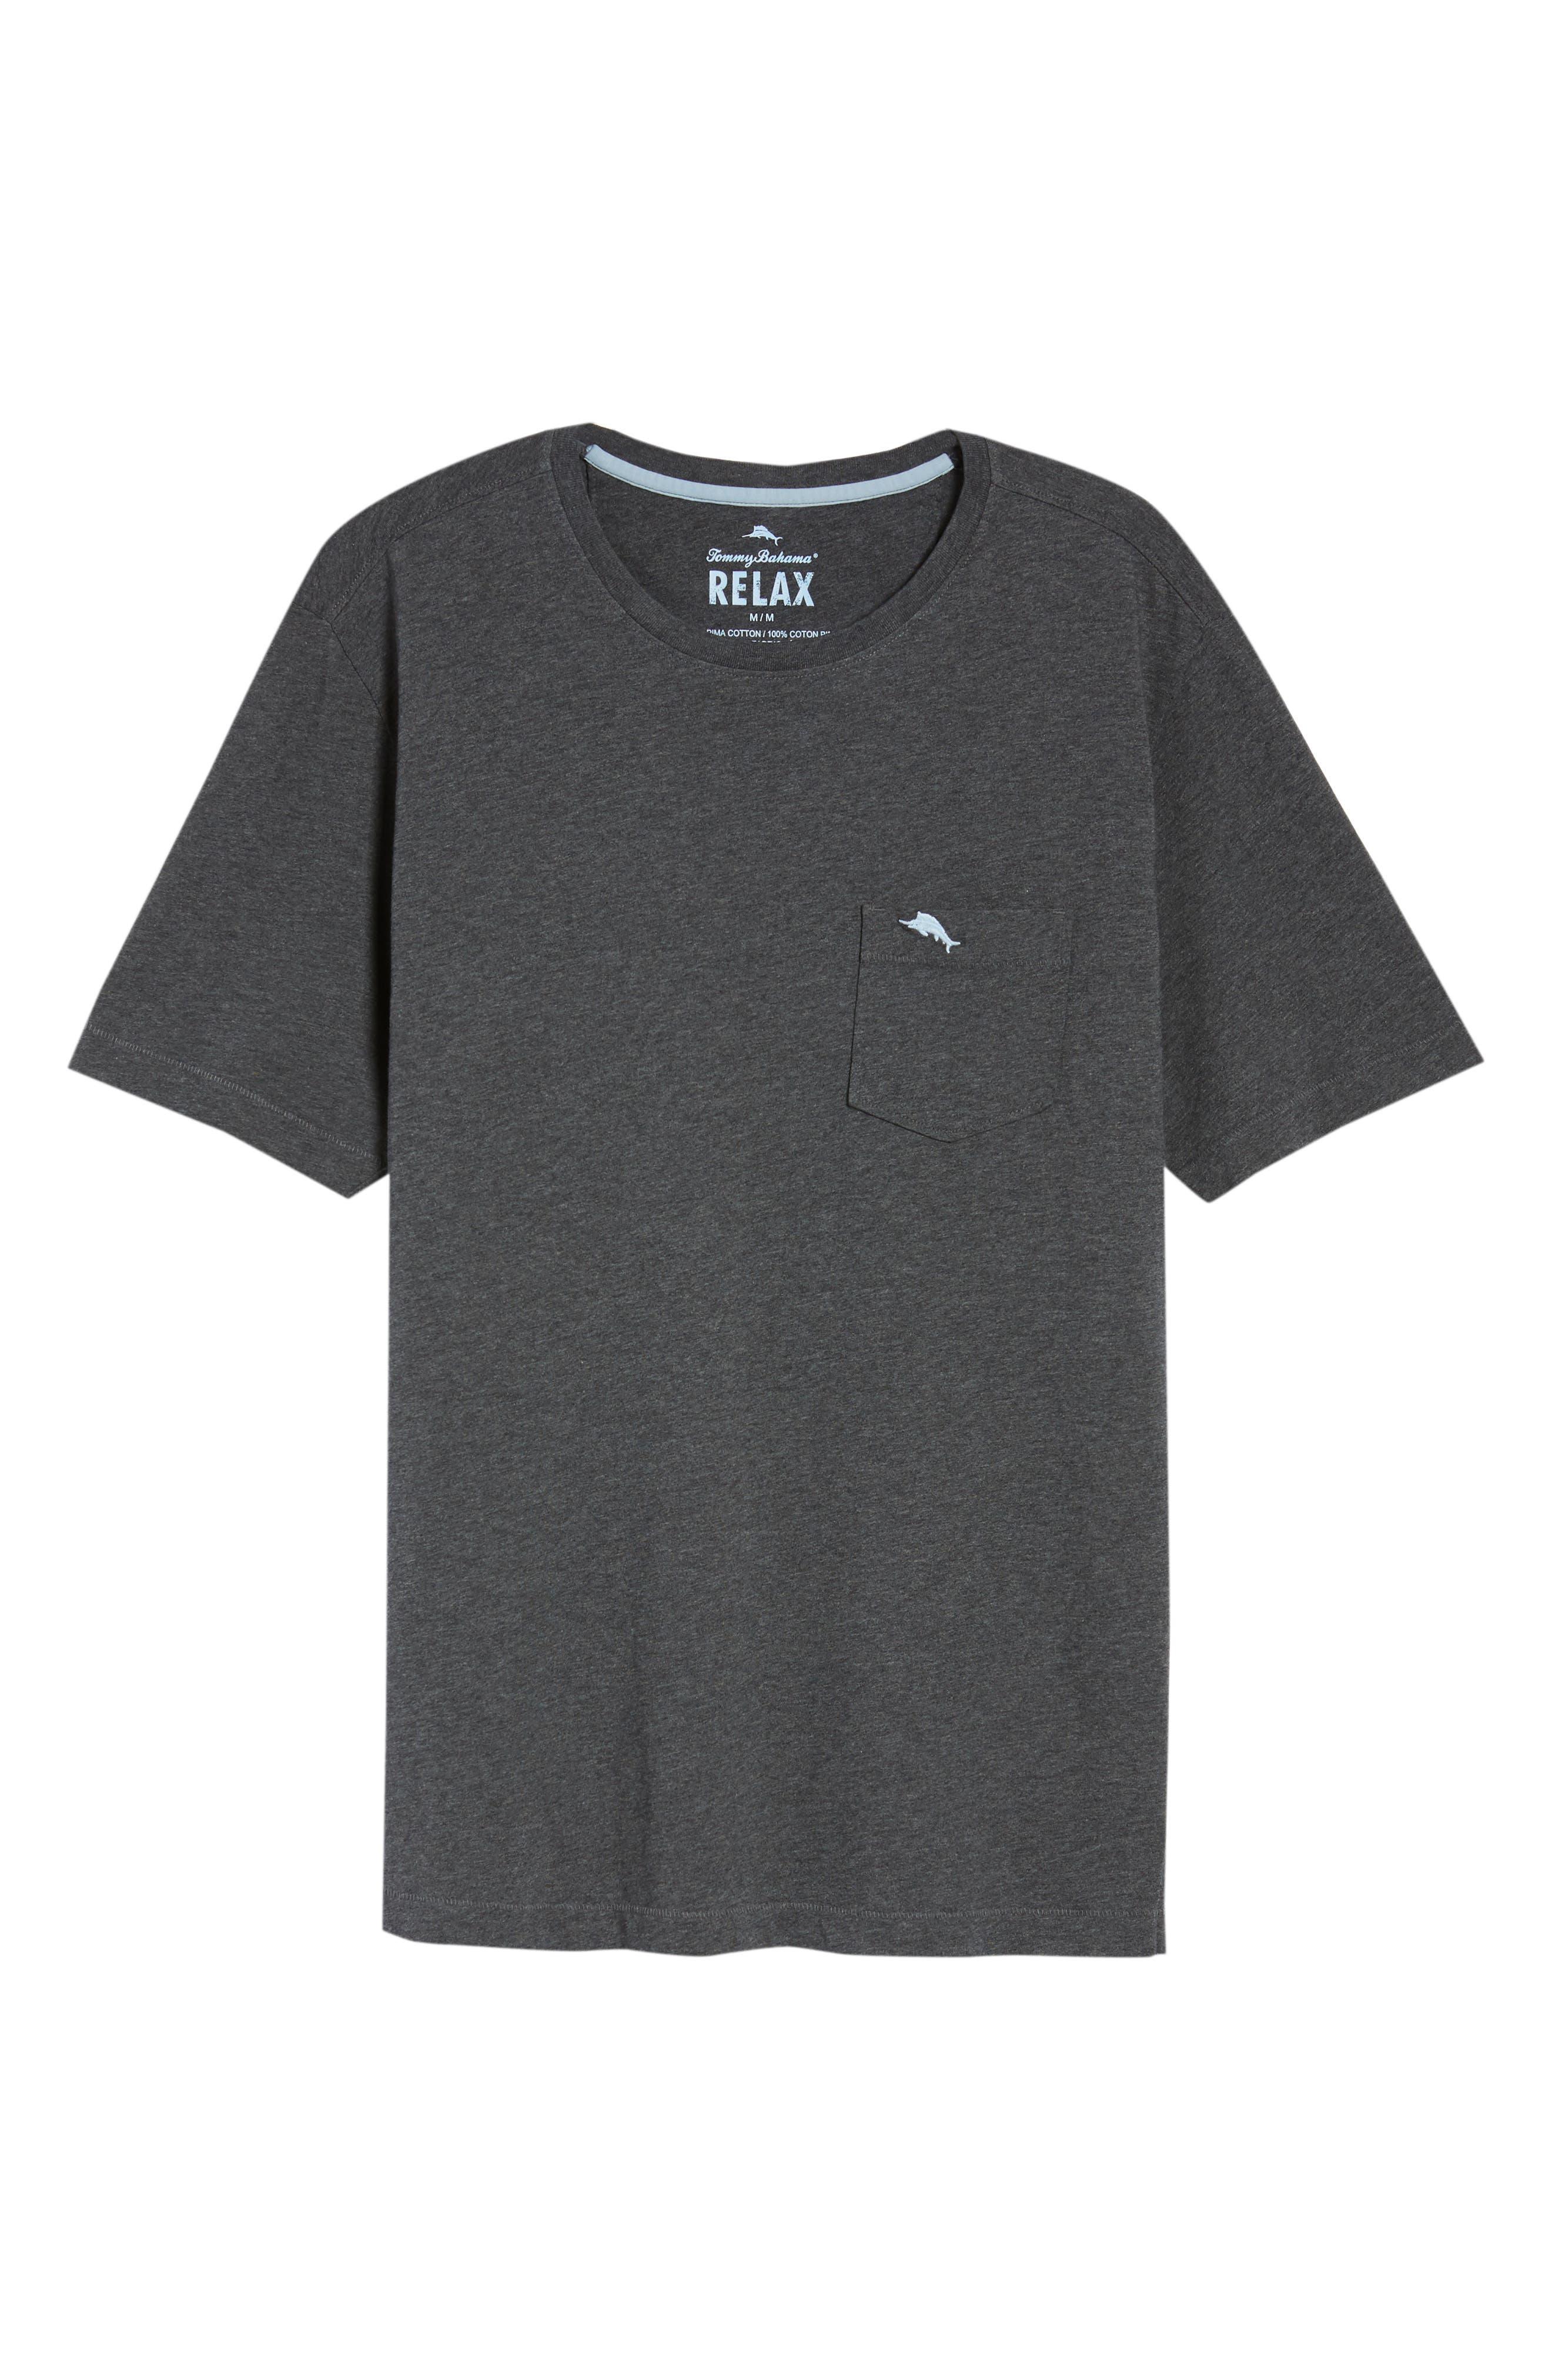 TOMMY BAHAMA, 'New Bali Sky' Original Fit Crewneck Pocket T-Shirt, Alternate thumbnail 6, color, CHARCOAL HEATHER